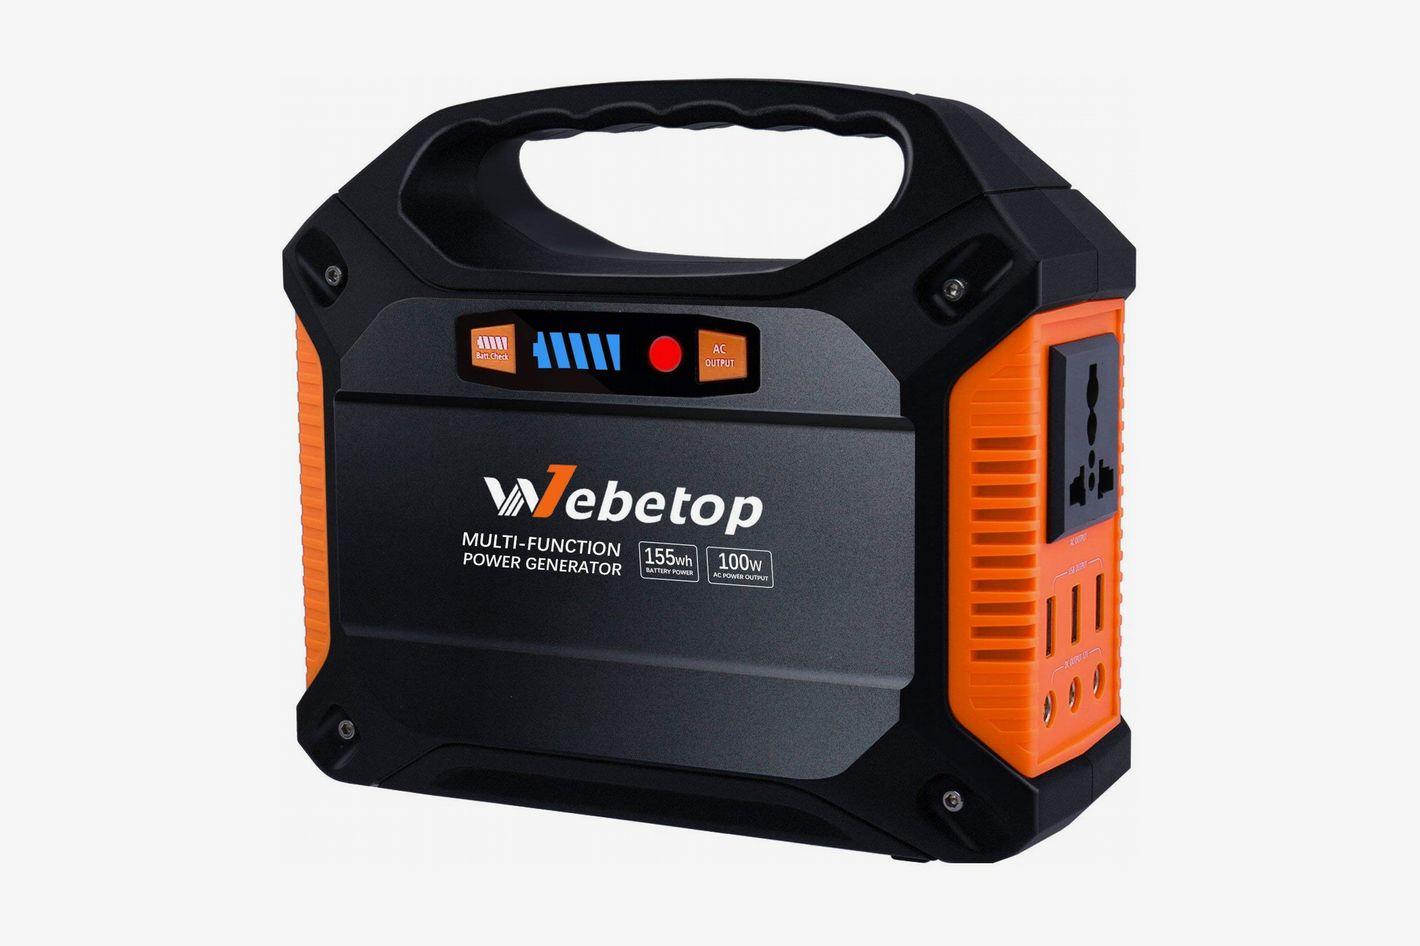 Webetop 155Wh Portable Generator